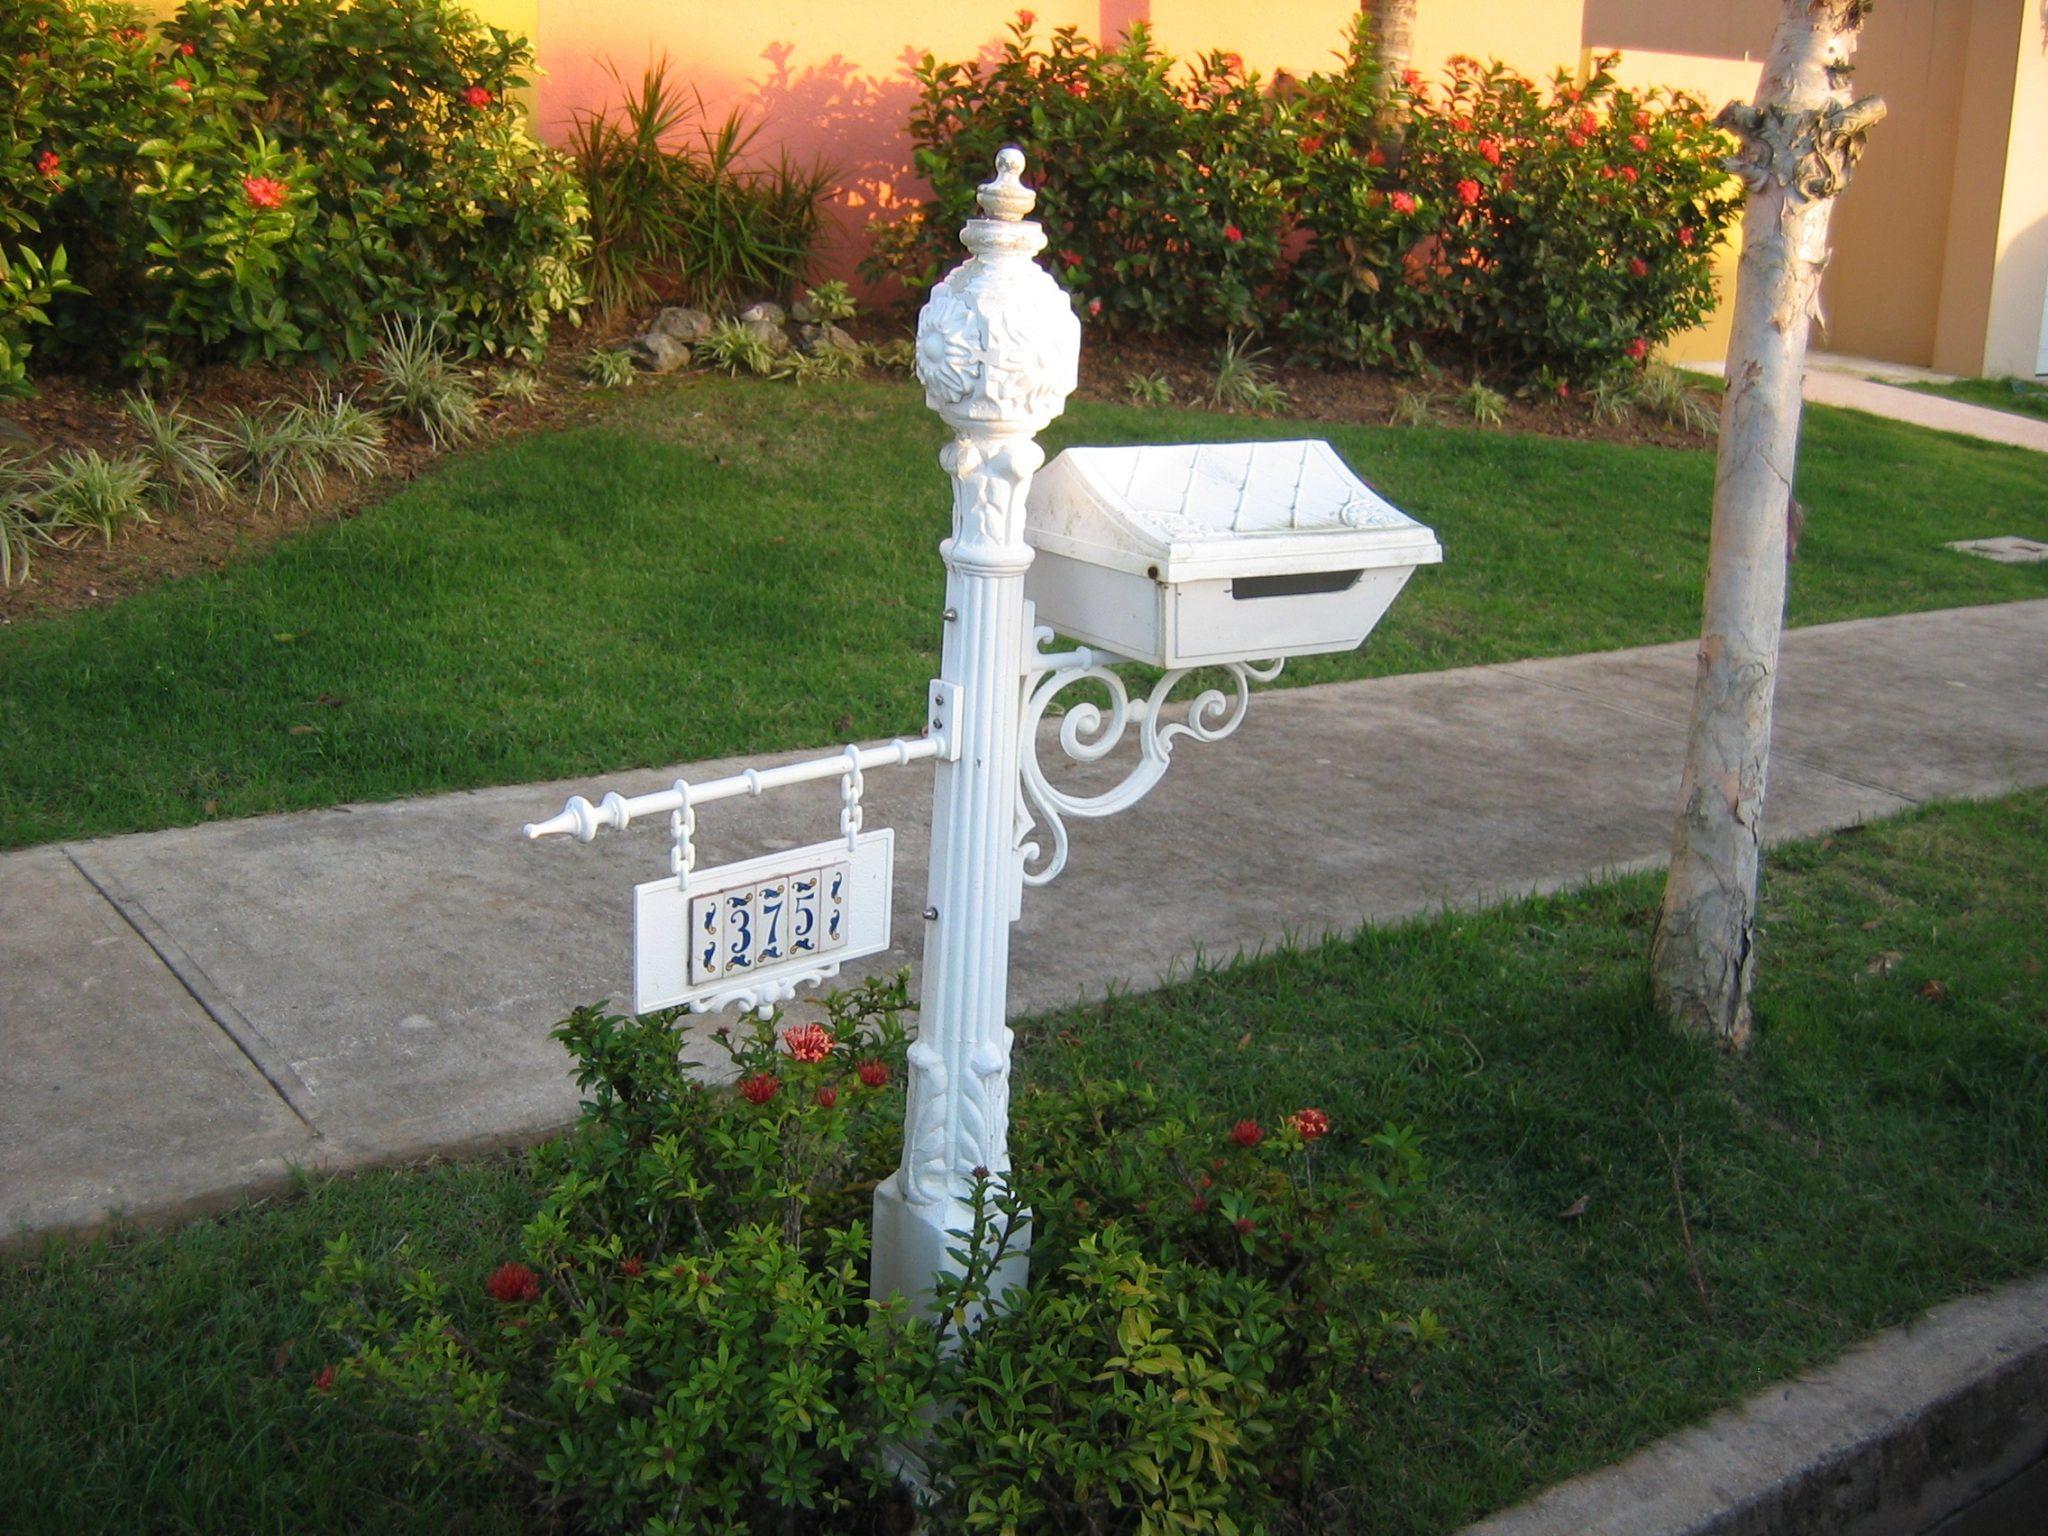 Sidewalk Landscaping Ideas